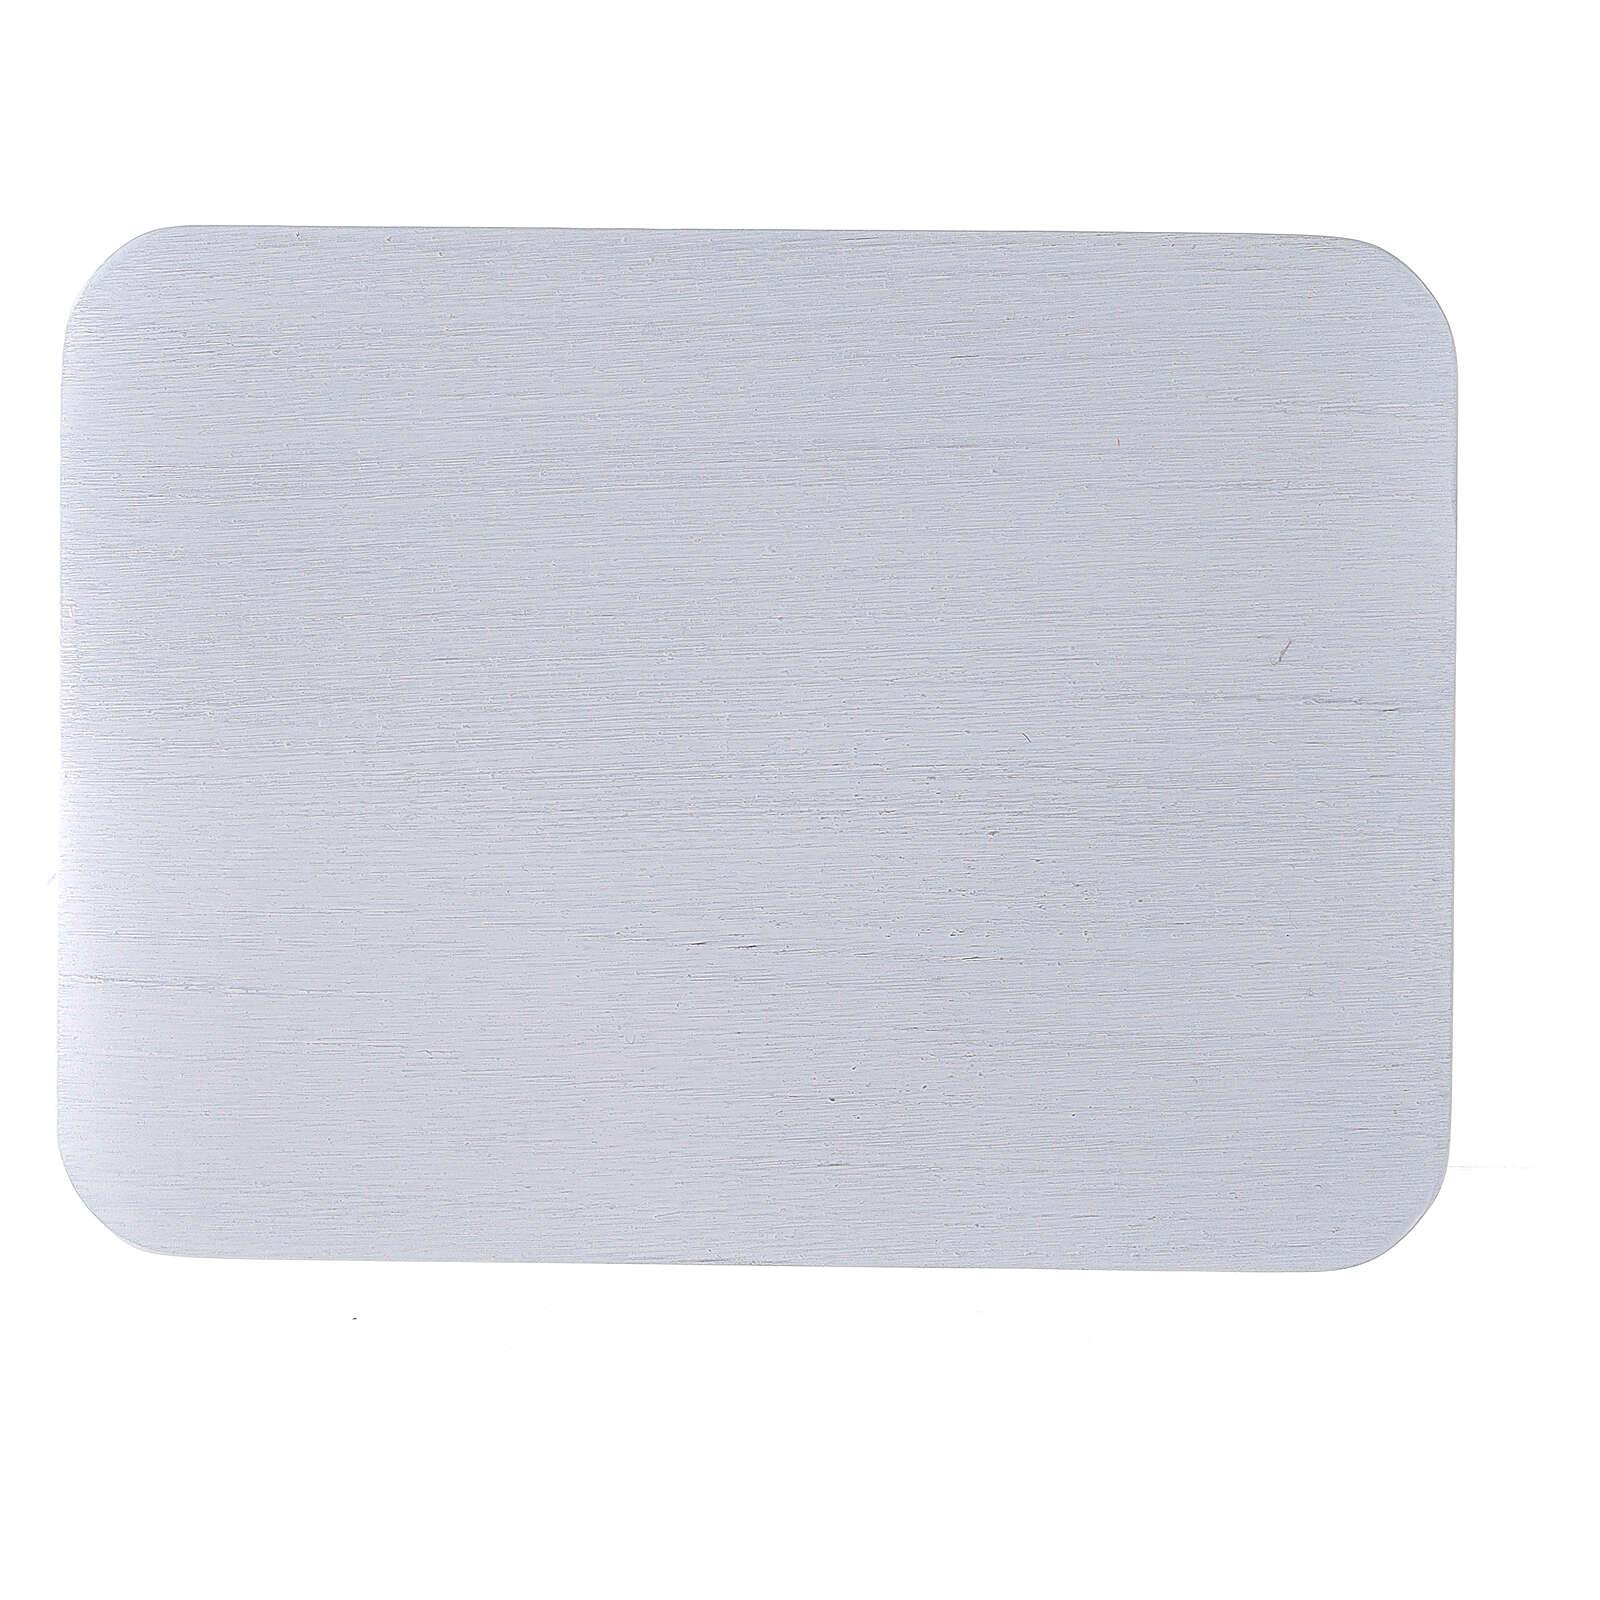 Plato rectangular vela aluminio cepillado 13,5x10 cm 3